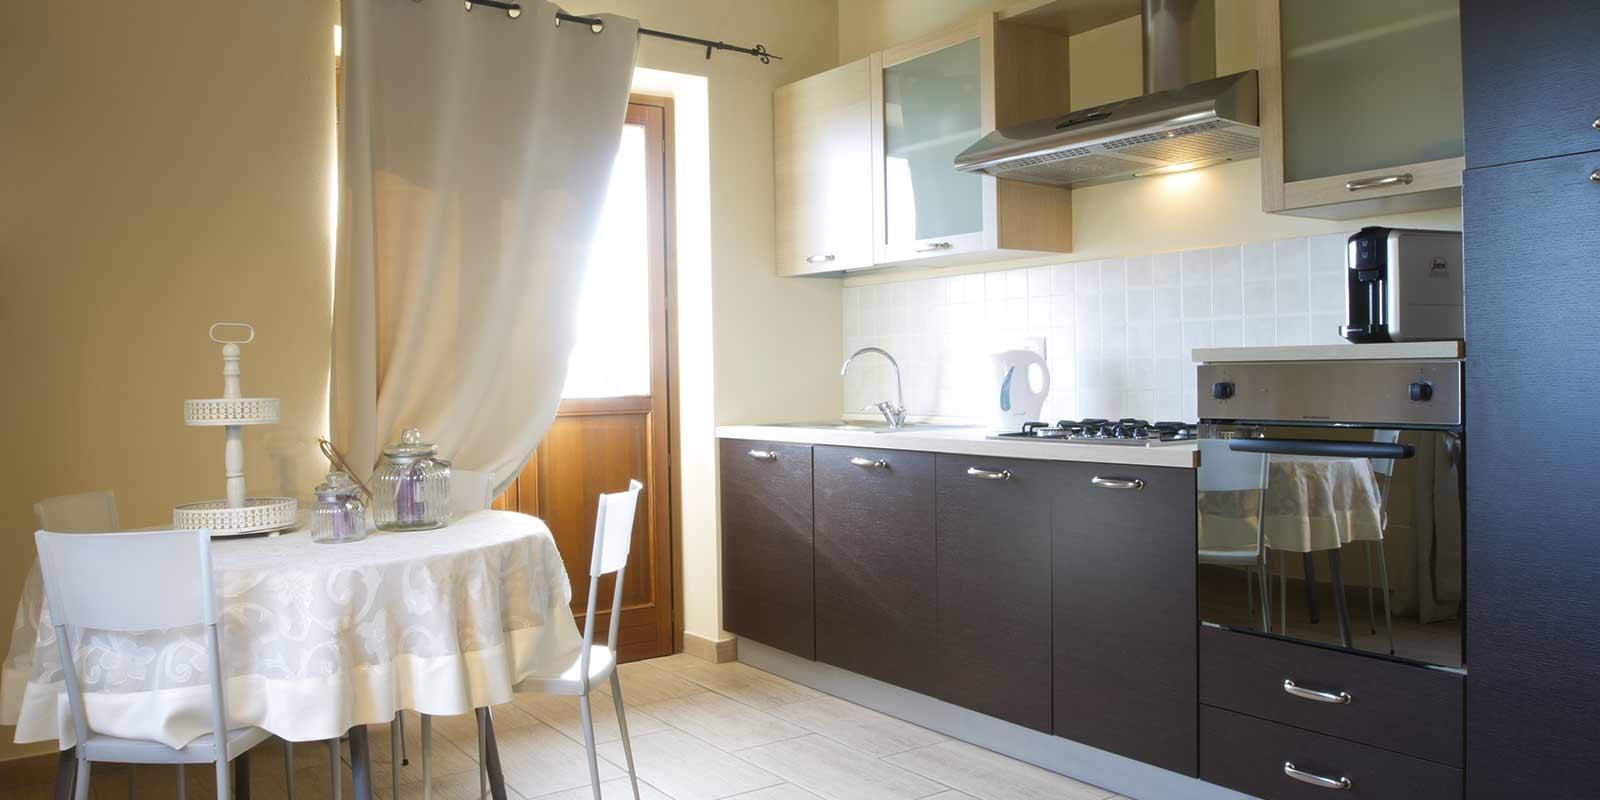 feltrinelli-cucina-sala-da-pranzo-agriturismo-cascina-crocelle-lago ...